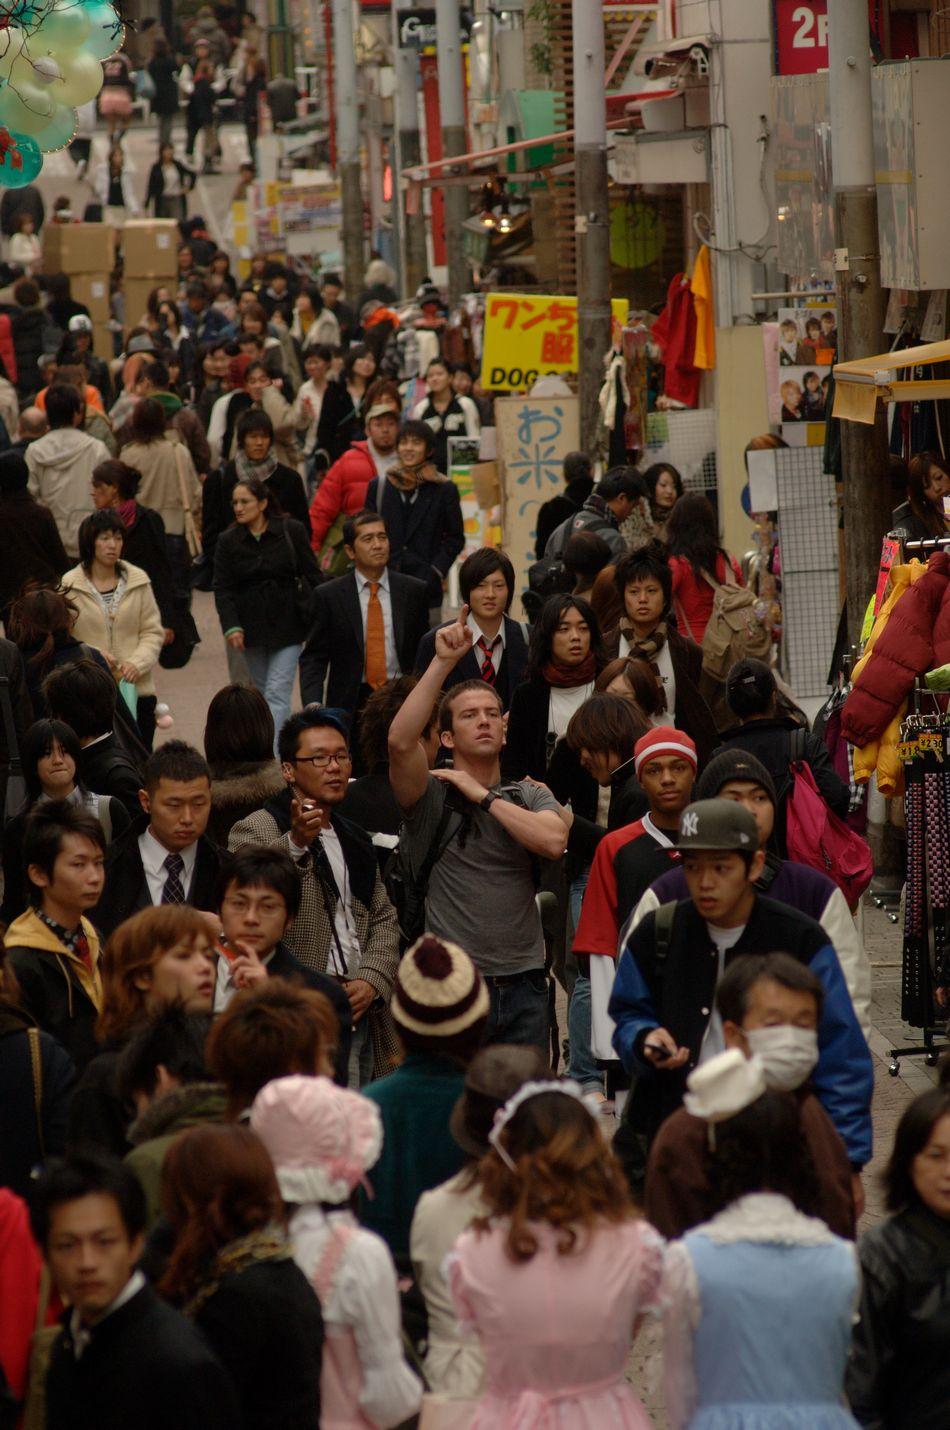 Тройной форсаж: Токийский дрифт, кадр № 2